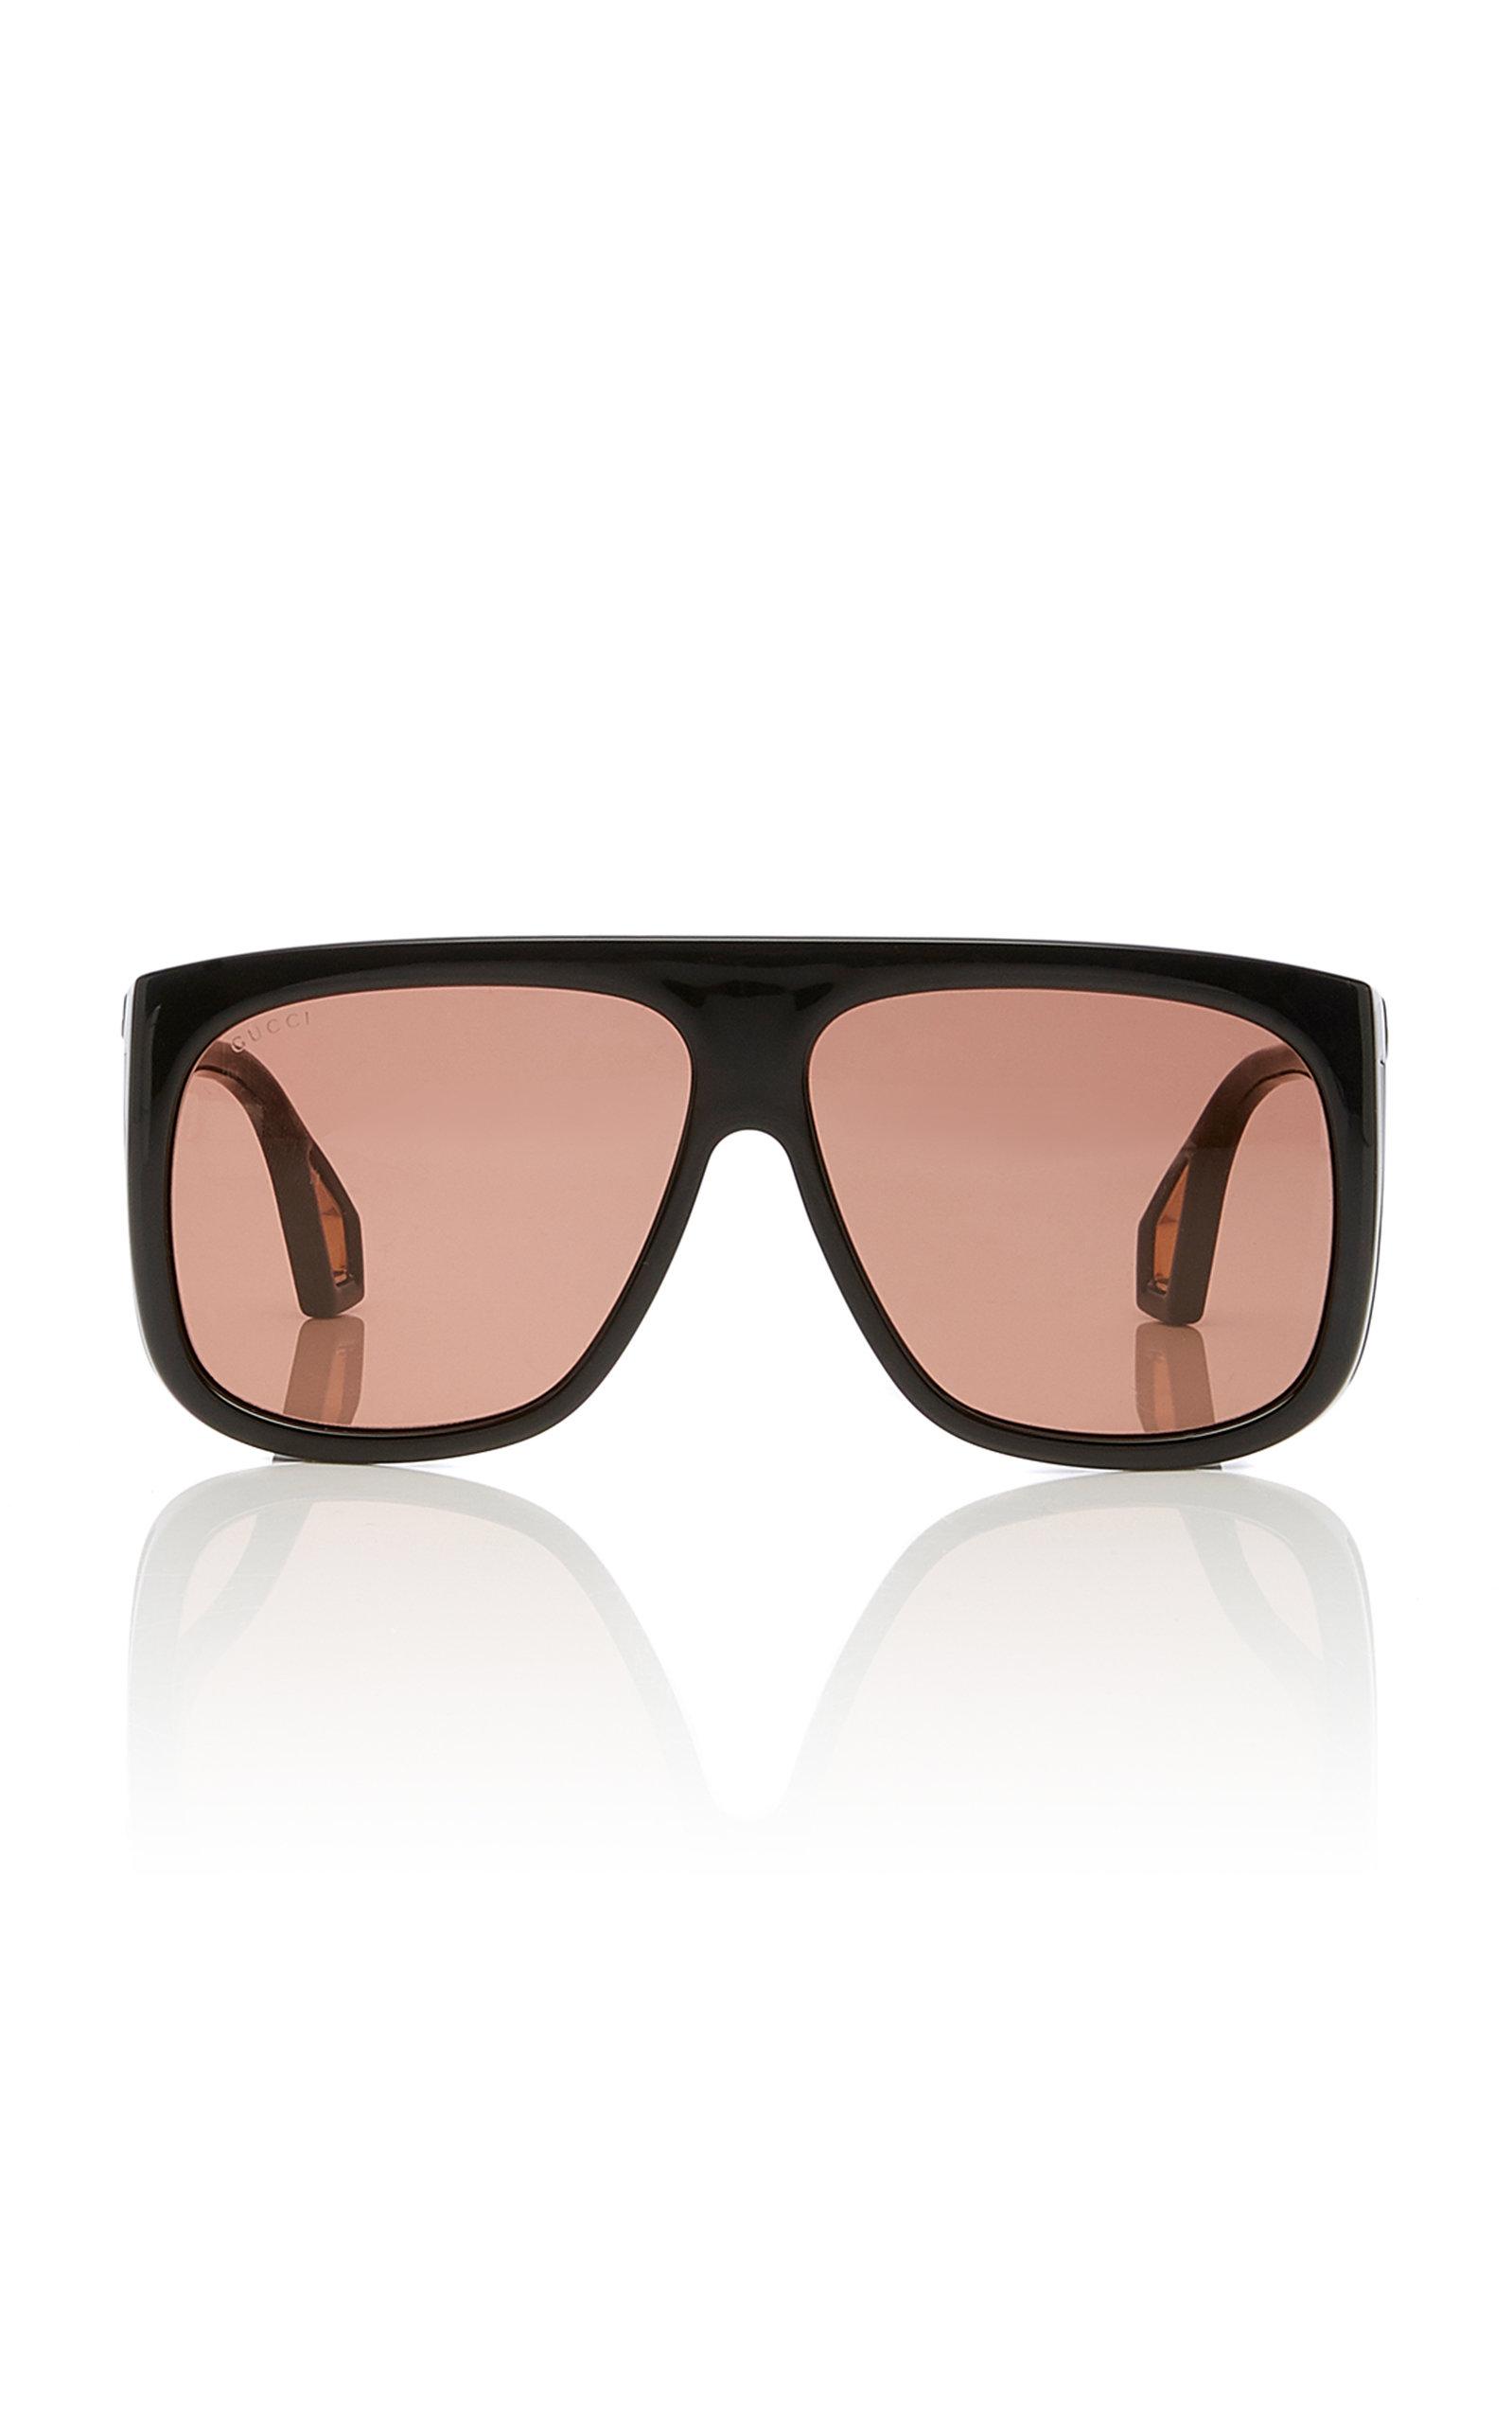 76fba86a384 Square-Frame Acetate Sunglasses by Gucci Sunglasses